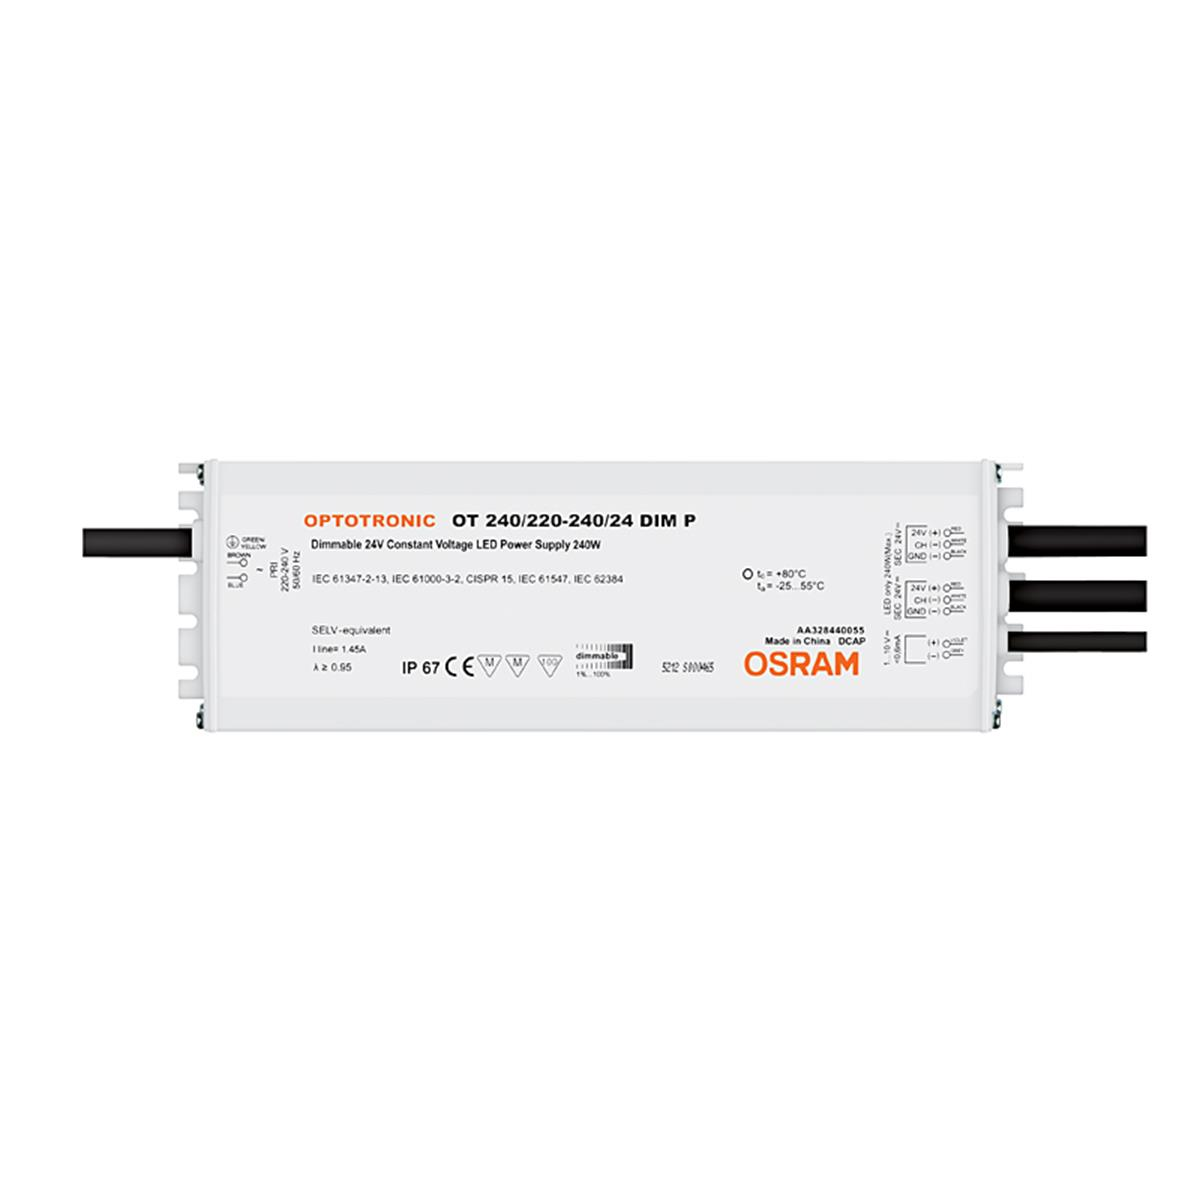 OSRAM OPTOTRONIC® OT 240/220-240/24 DIM P ...